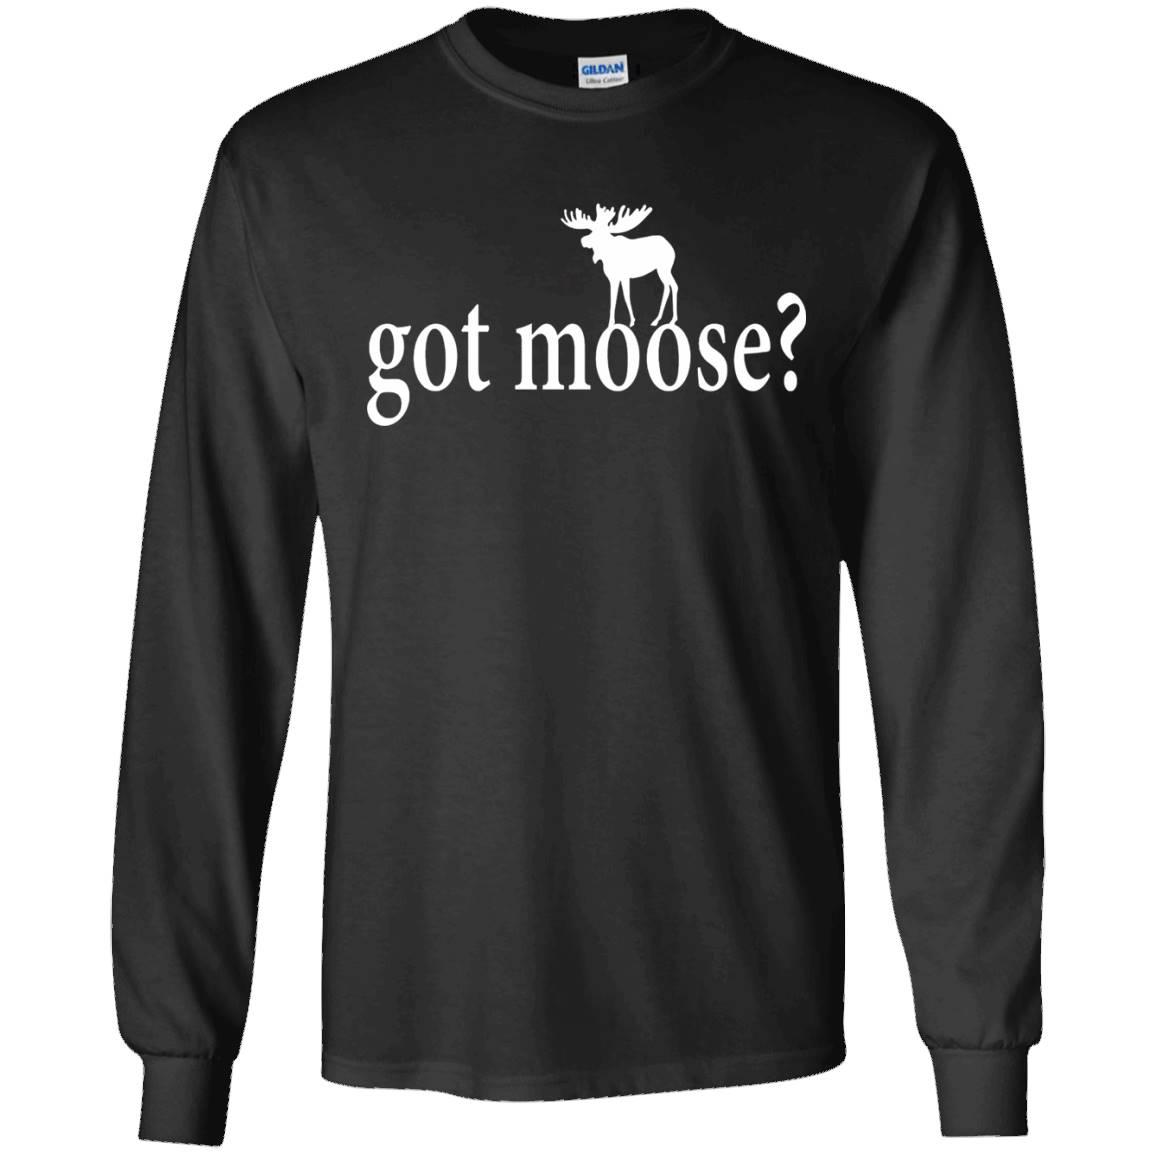 Funny Got Moose T-Shirt – Long Sleeve Tee